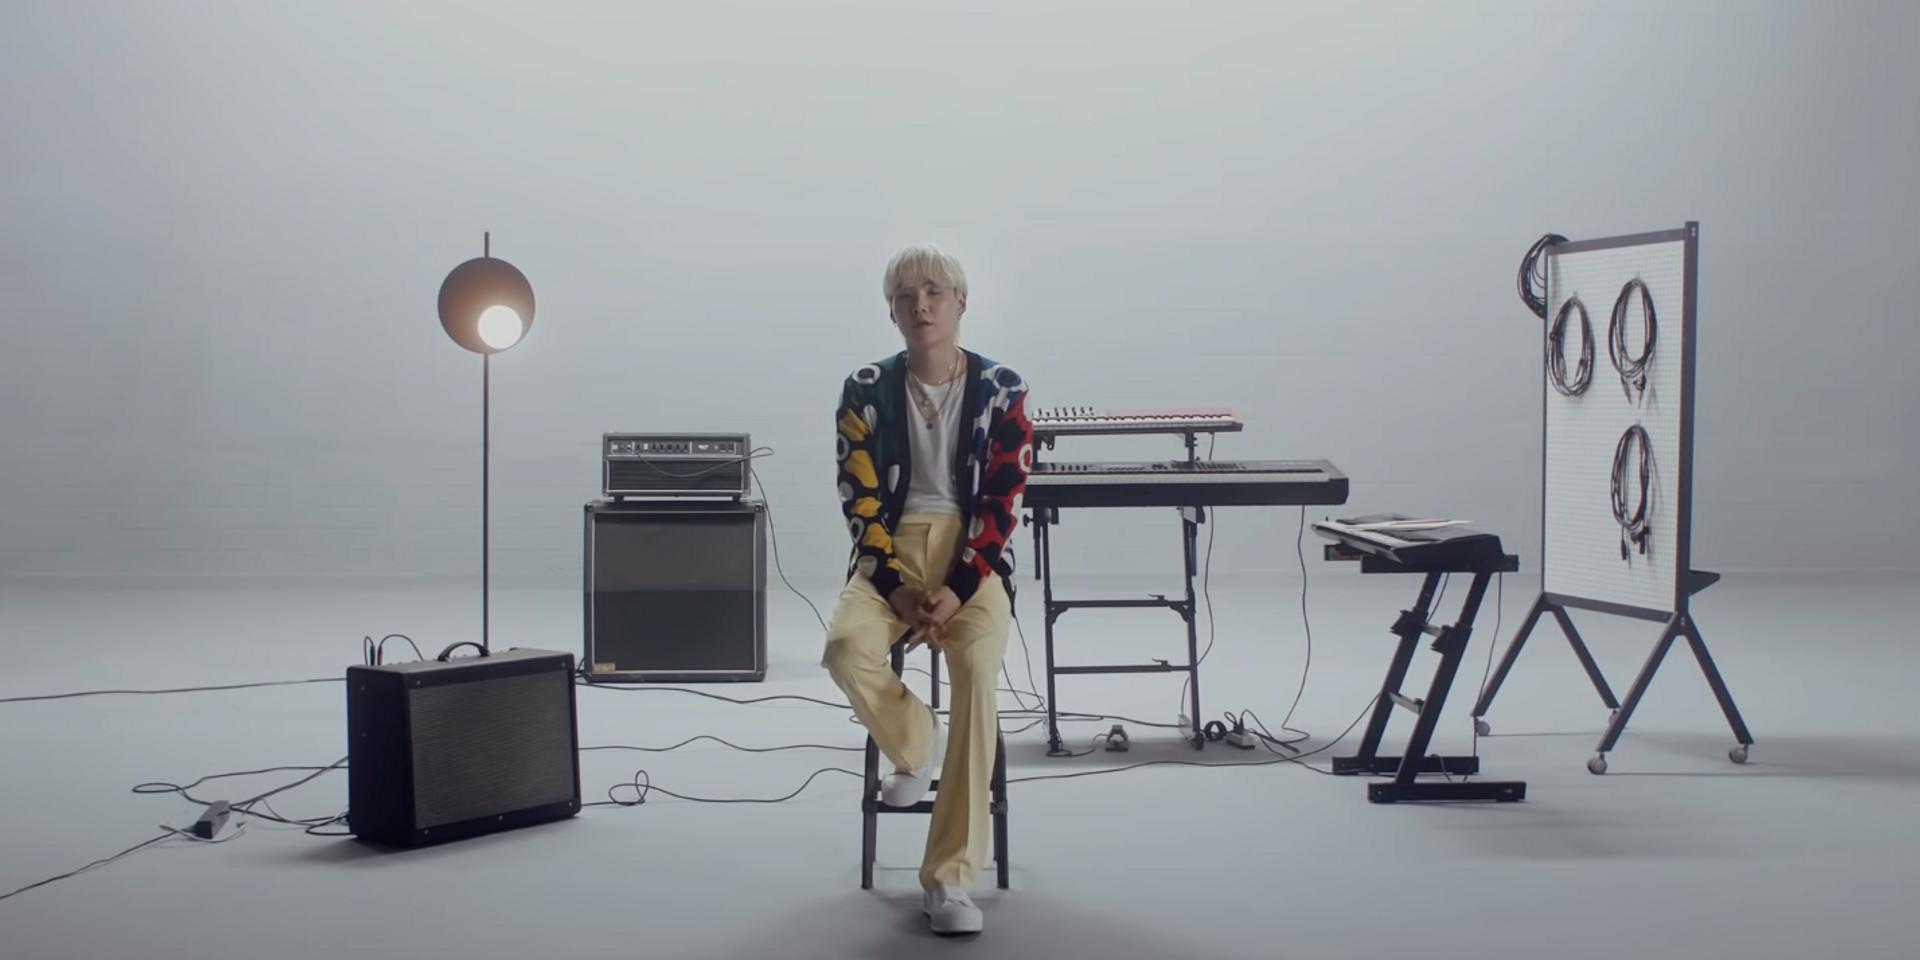 BTS' SUGA reimagines Samsung Galaxy's iconic ringtone 'Over The Horizon'